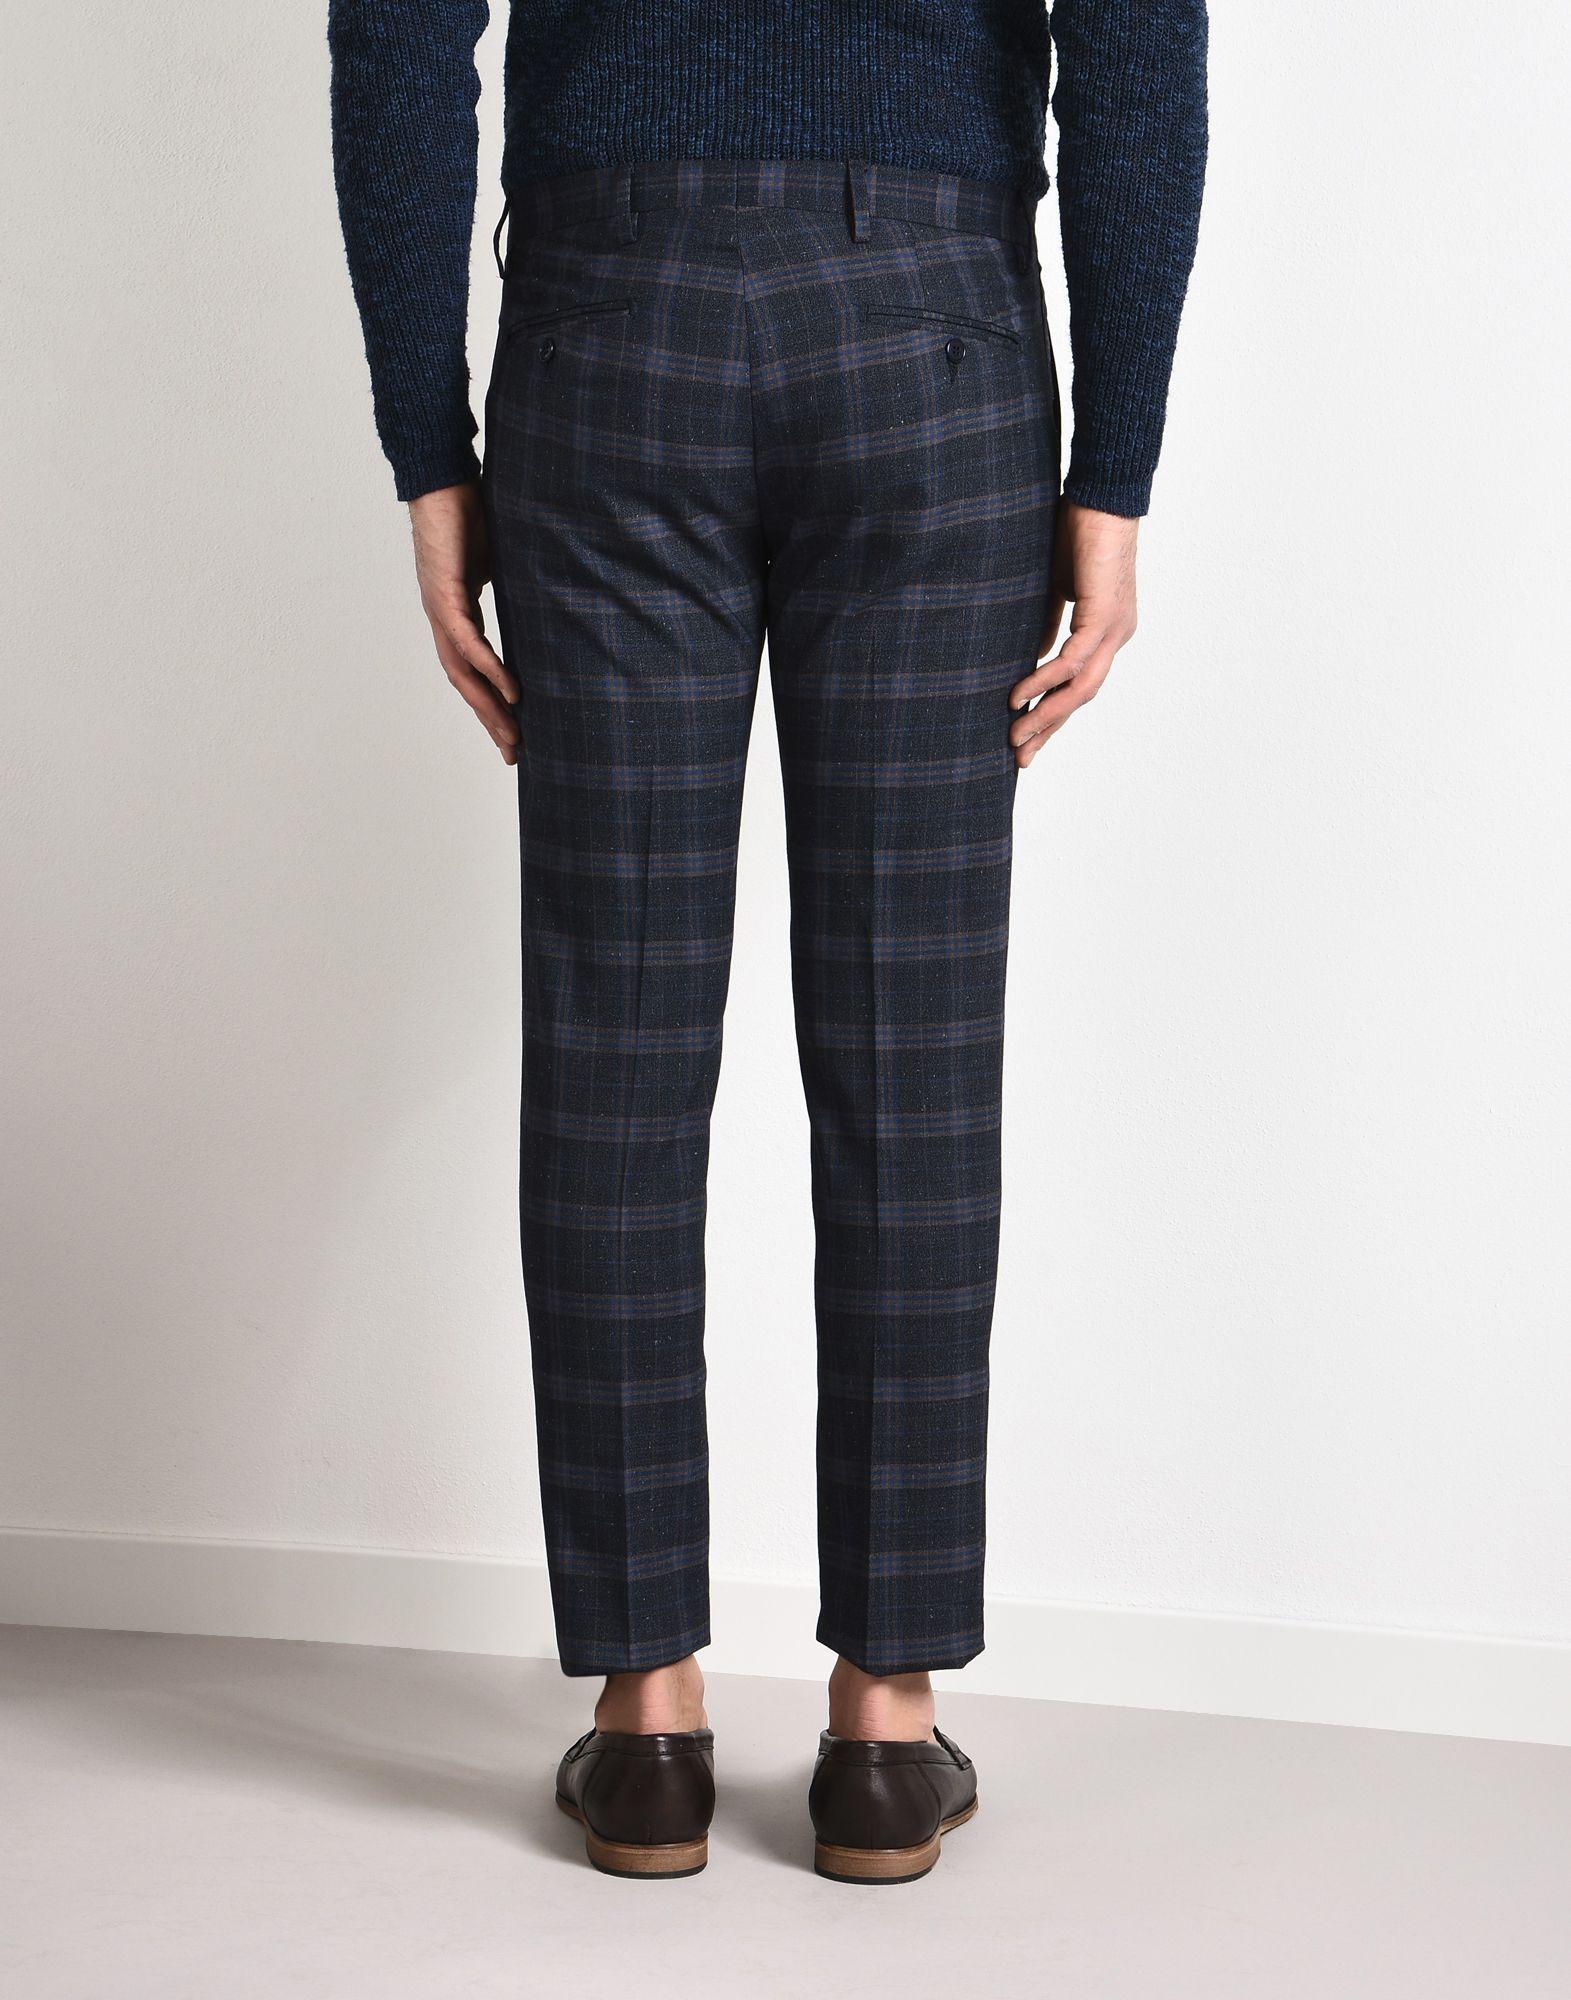 A buon mercato Pantalone 8 Uomo 13174466XL - 13174466XL Uomo d0915f